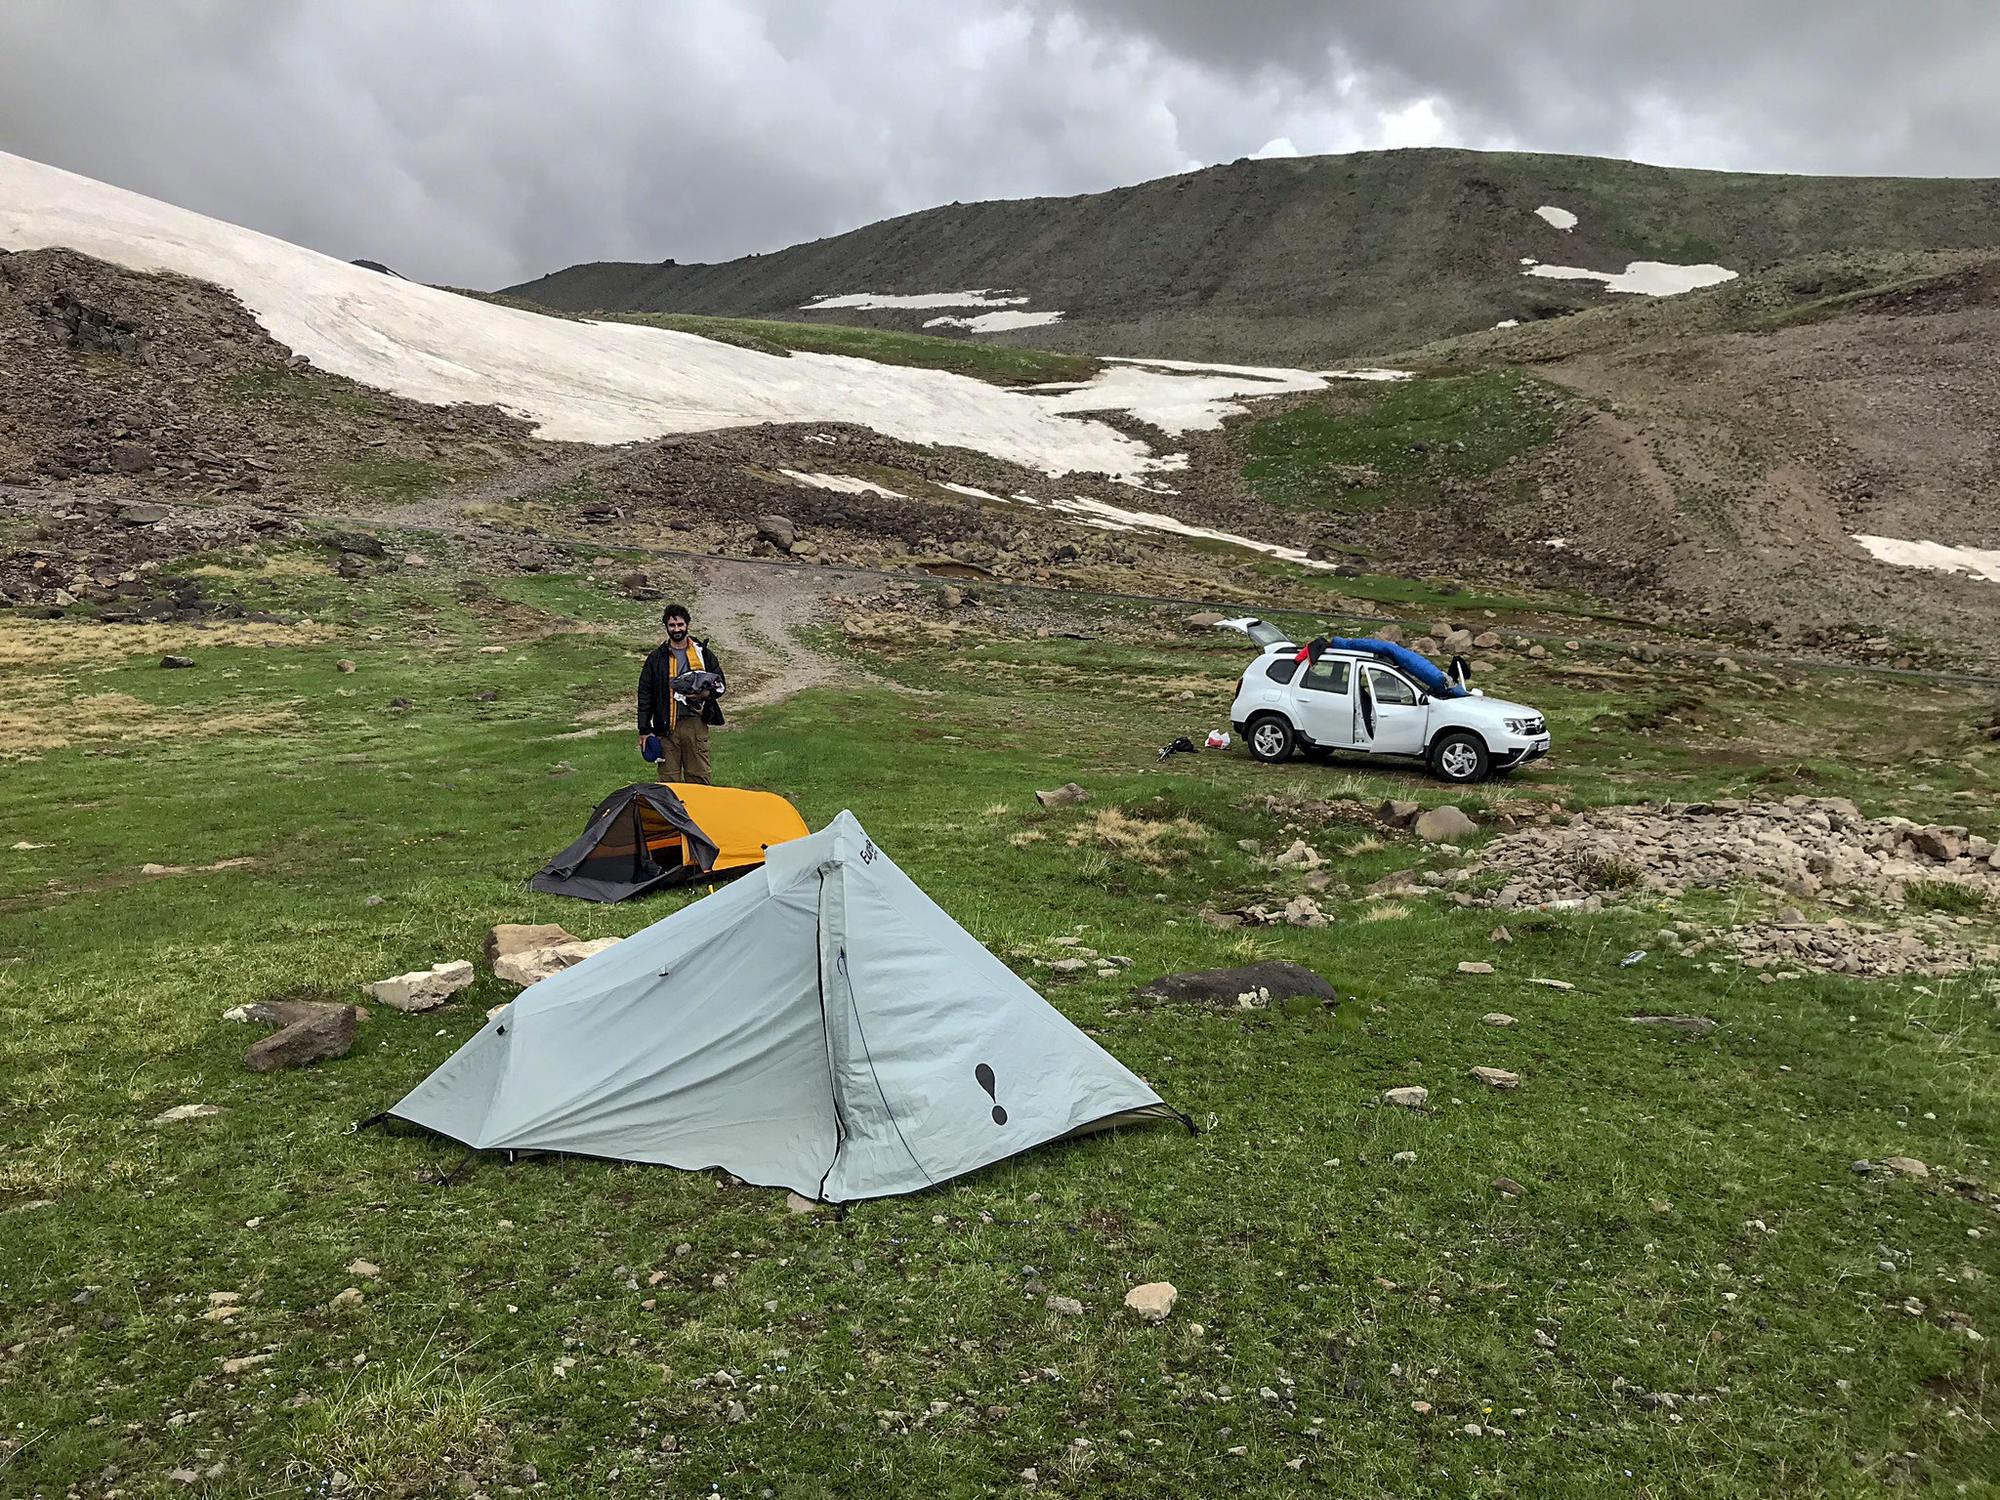 Hiking in Armenia